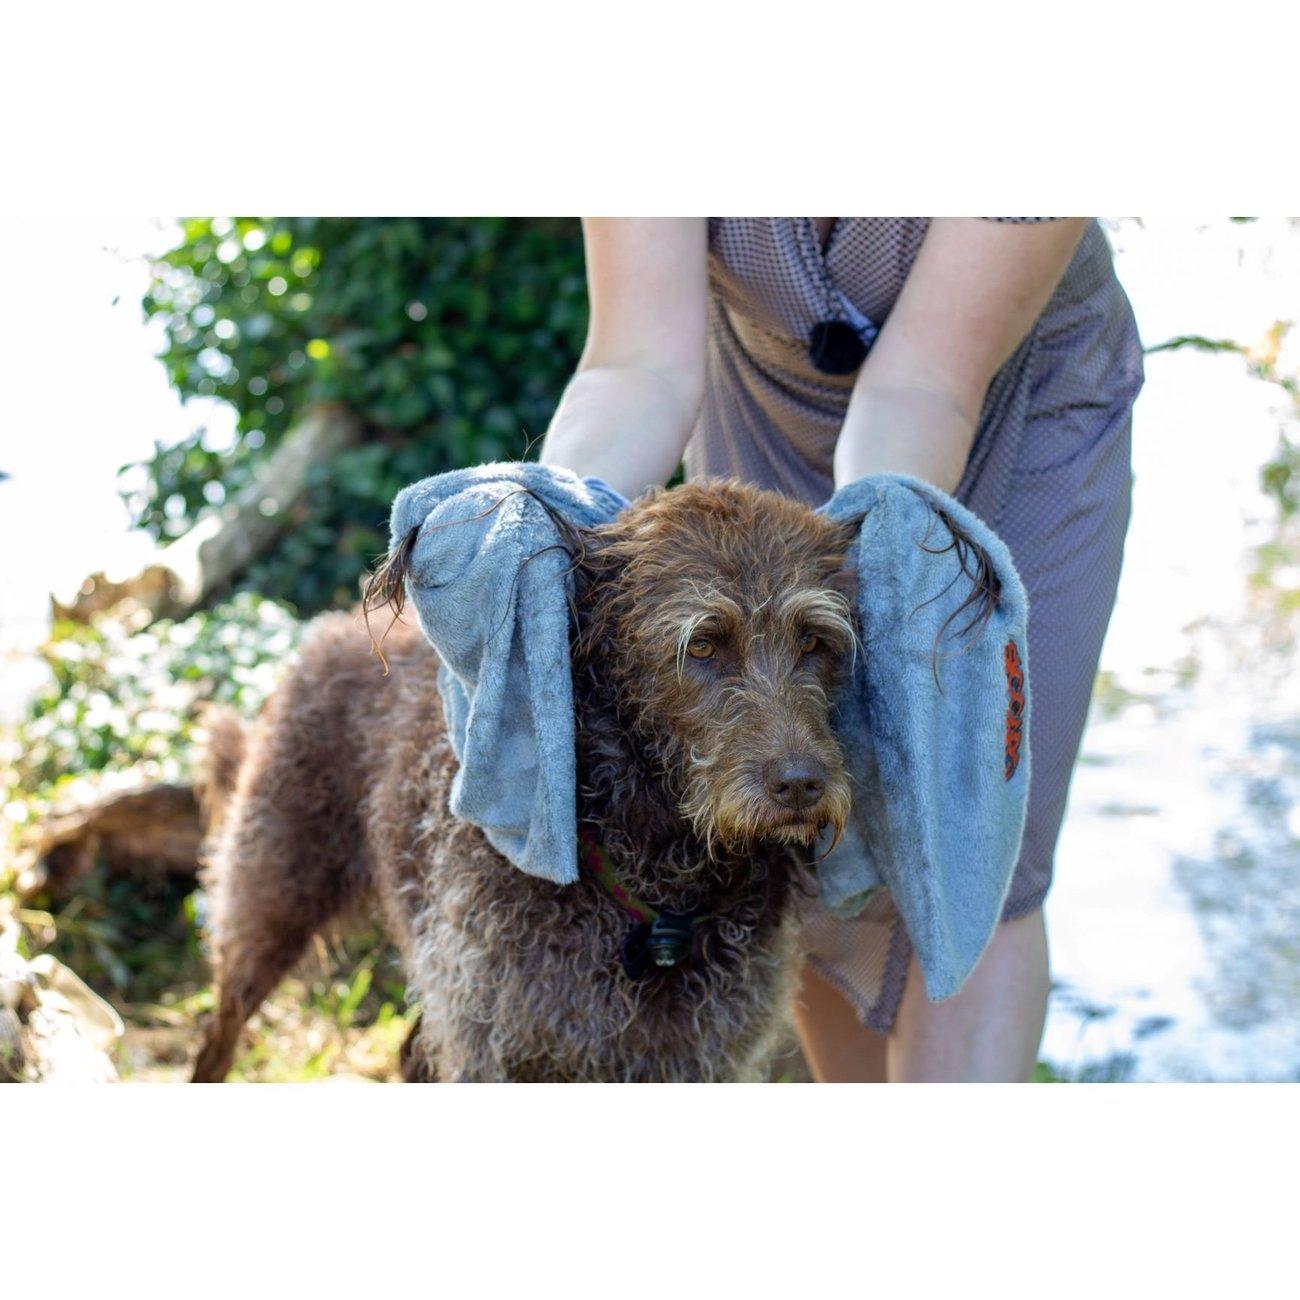 SICCARO Handtuch EasyDry Towel für Hunde, Bild 6